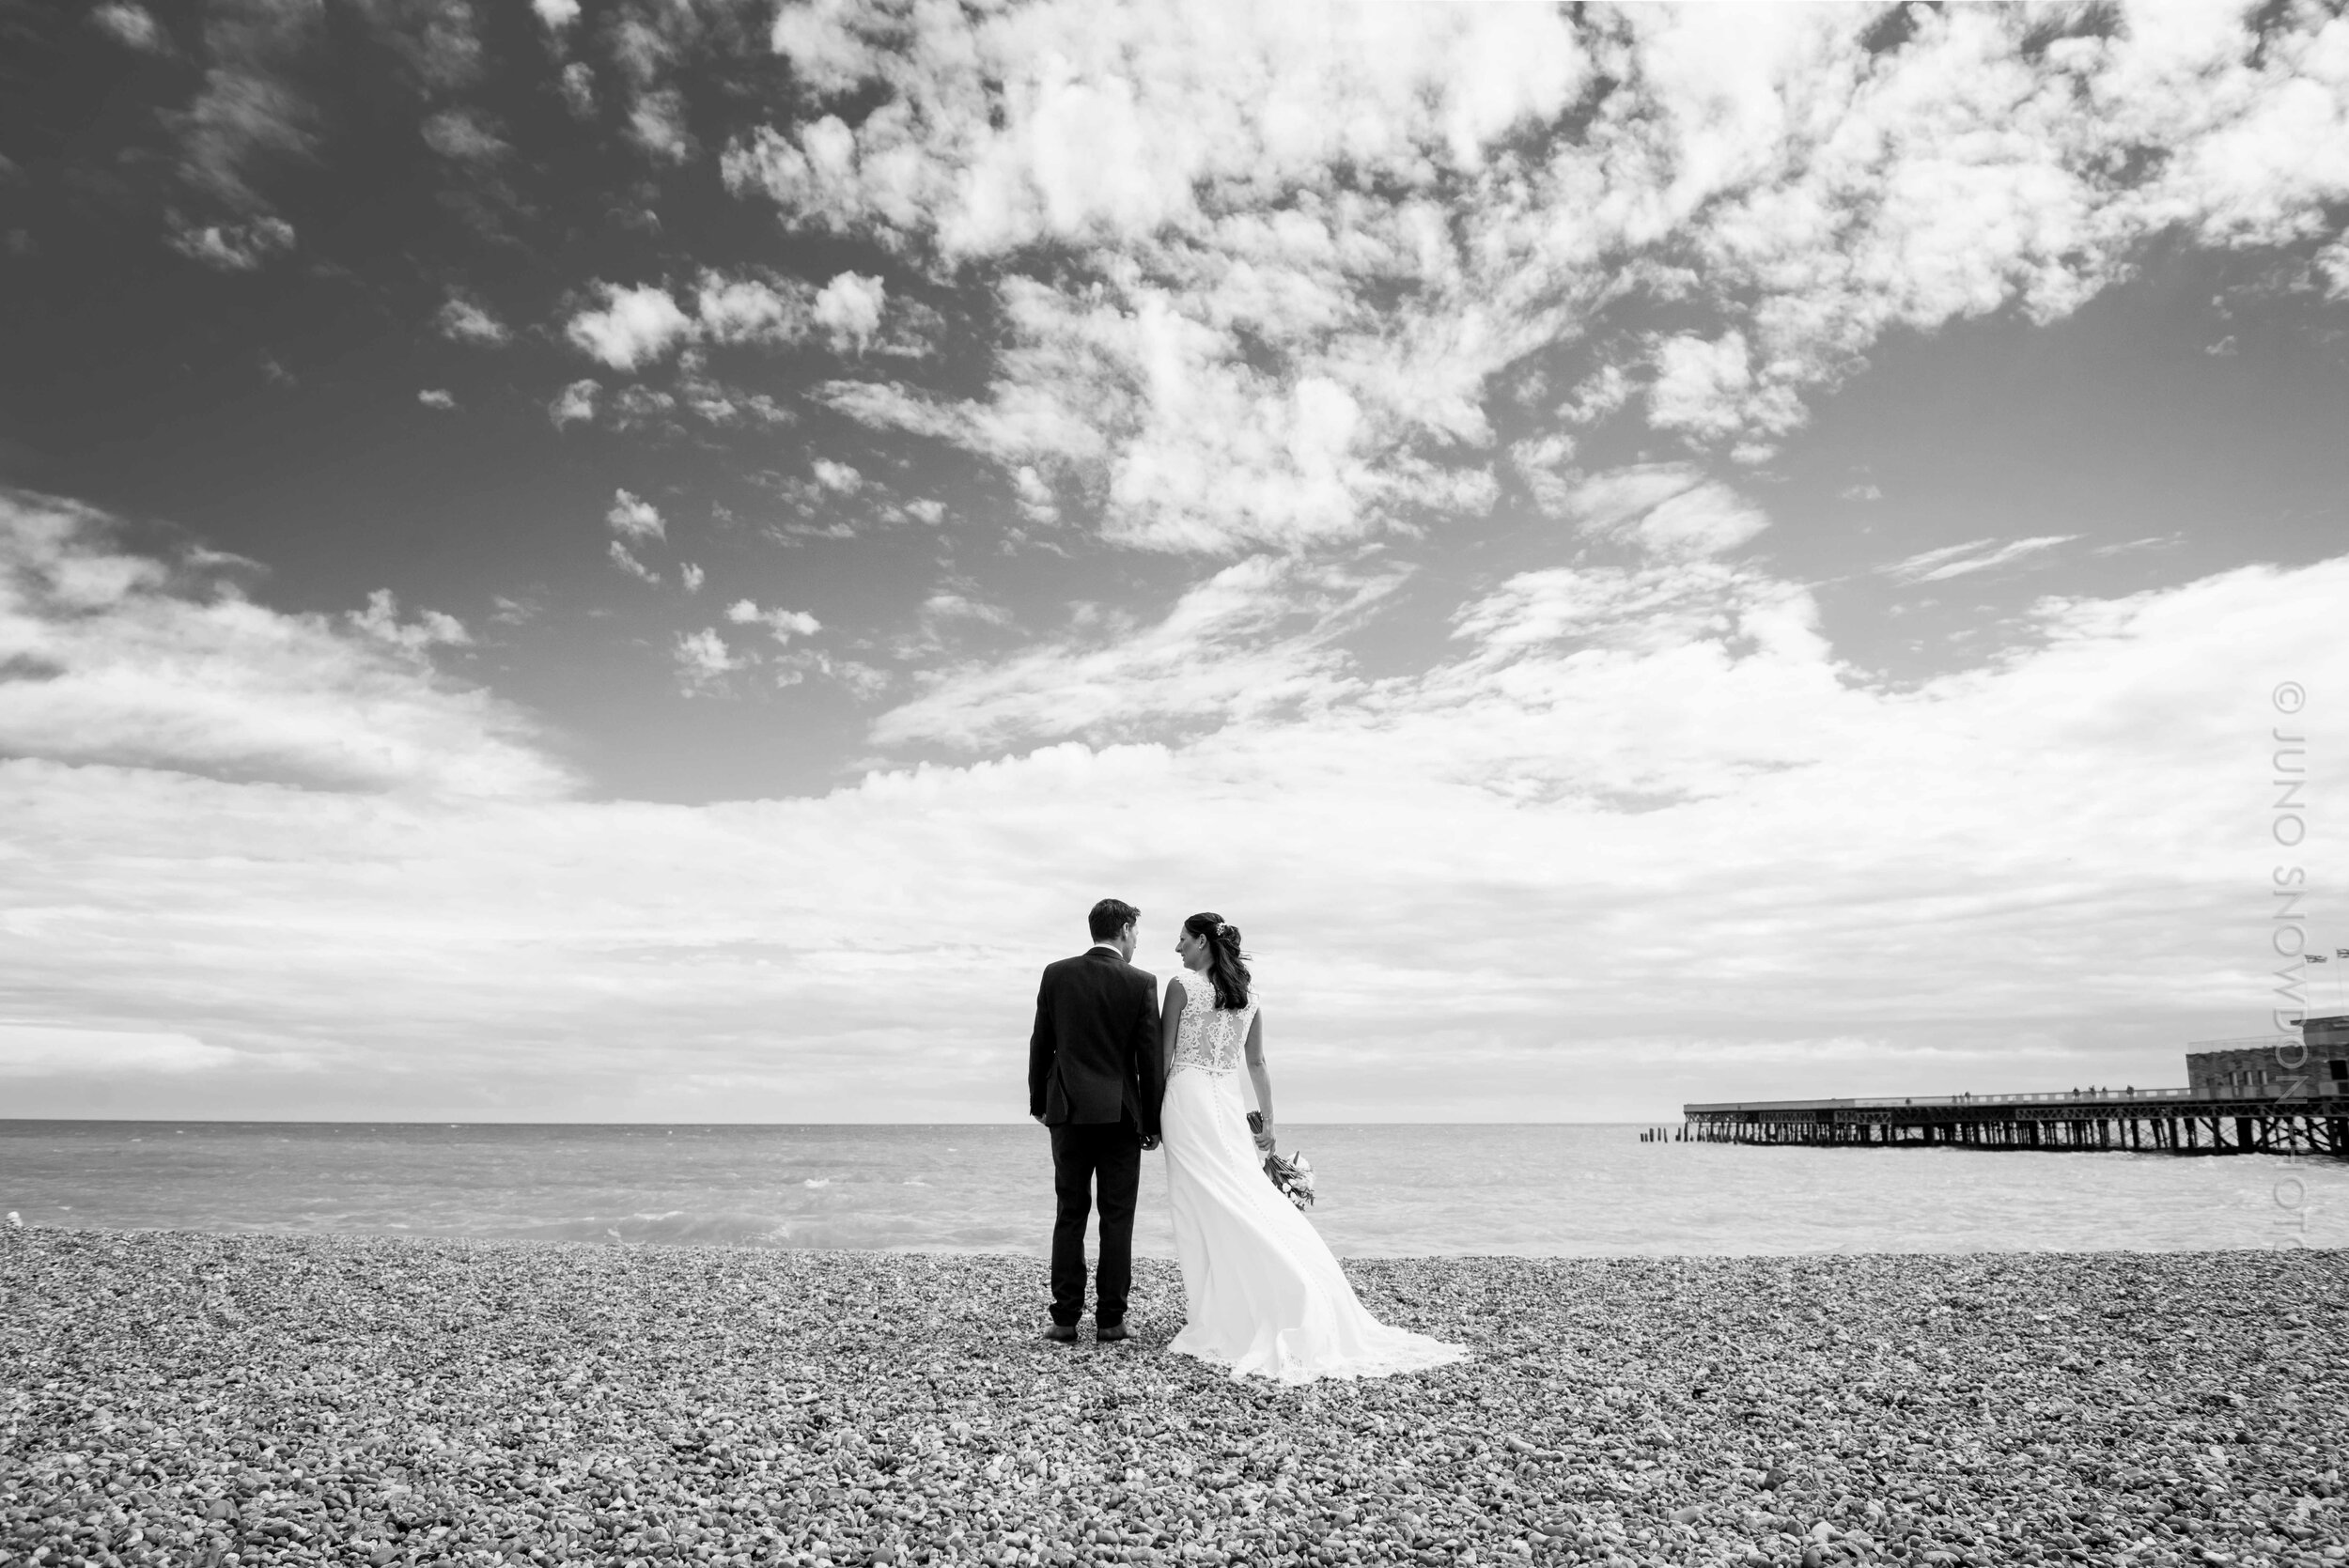 juno-snowdon-photography-wedding-7558.jpg